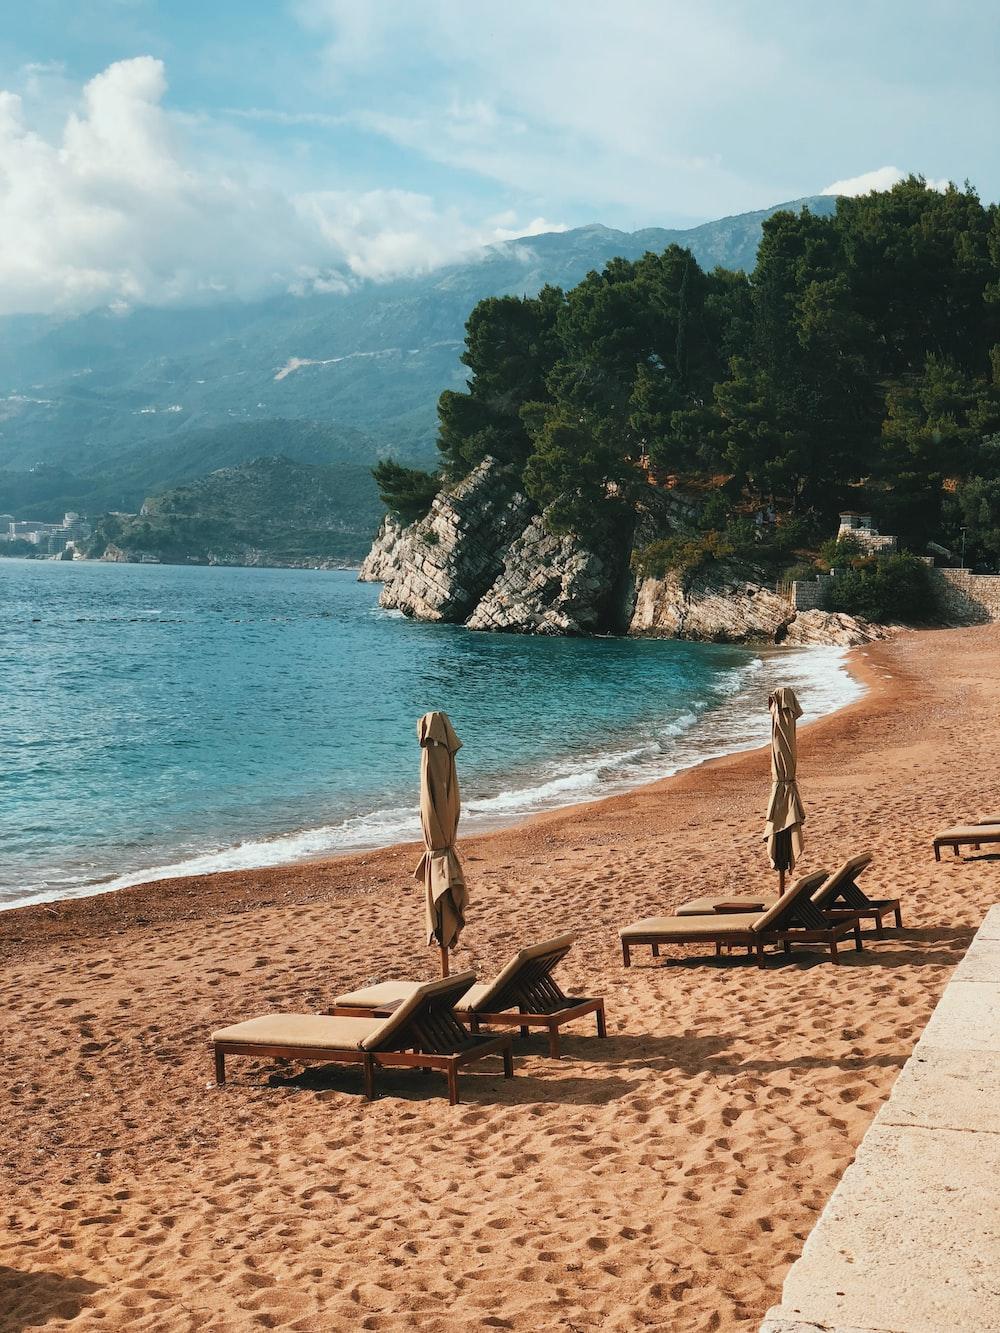 Empty Outdoor Loungers Near Shore